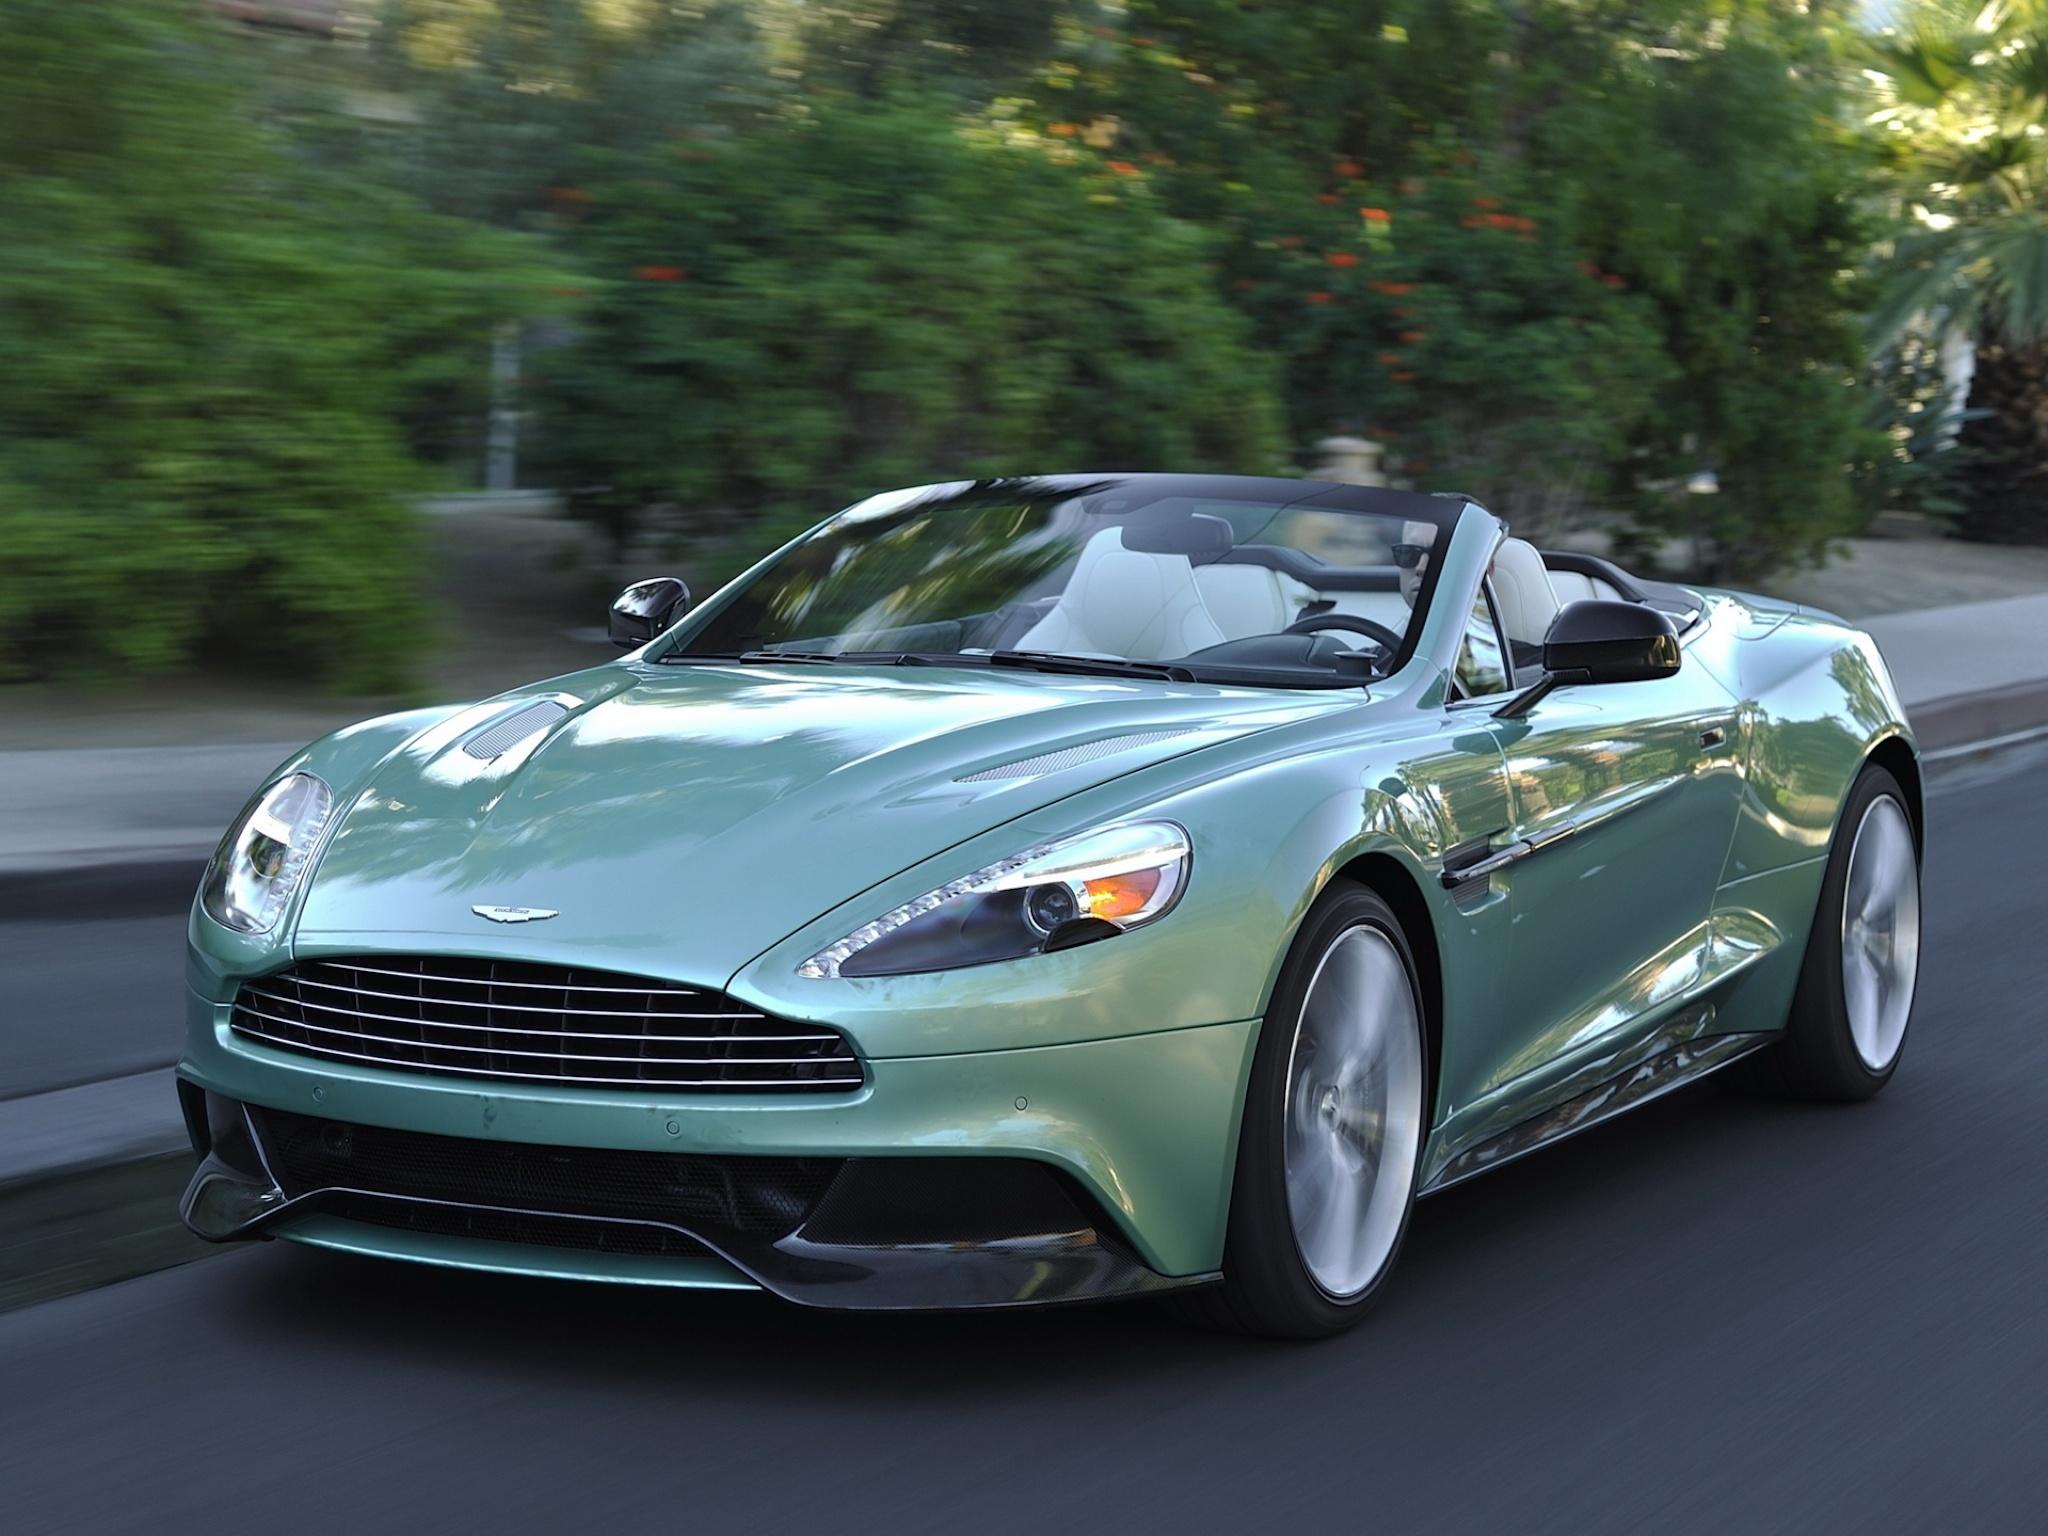 Aston Martin Vanquish Volante Wallpaper Free Downloads